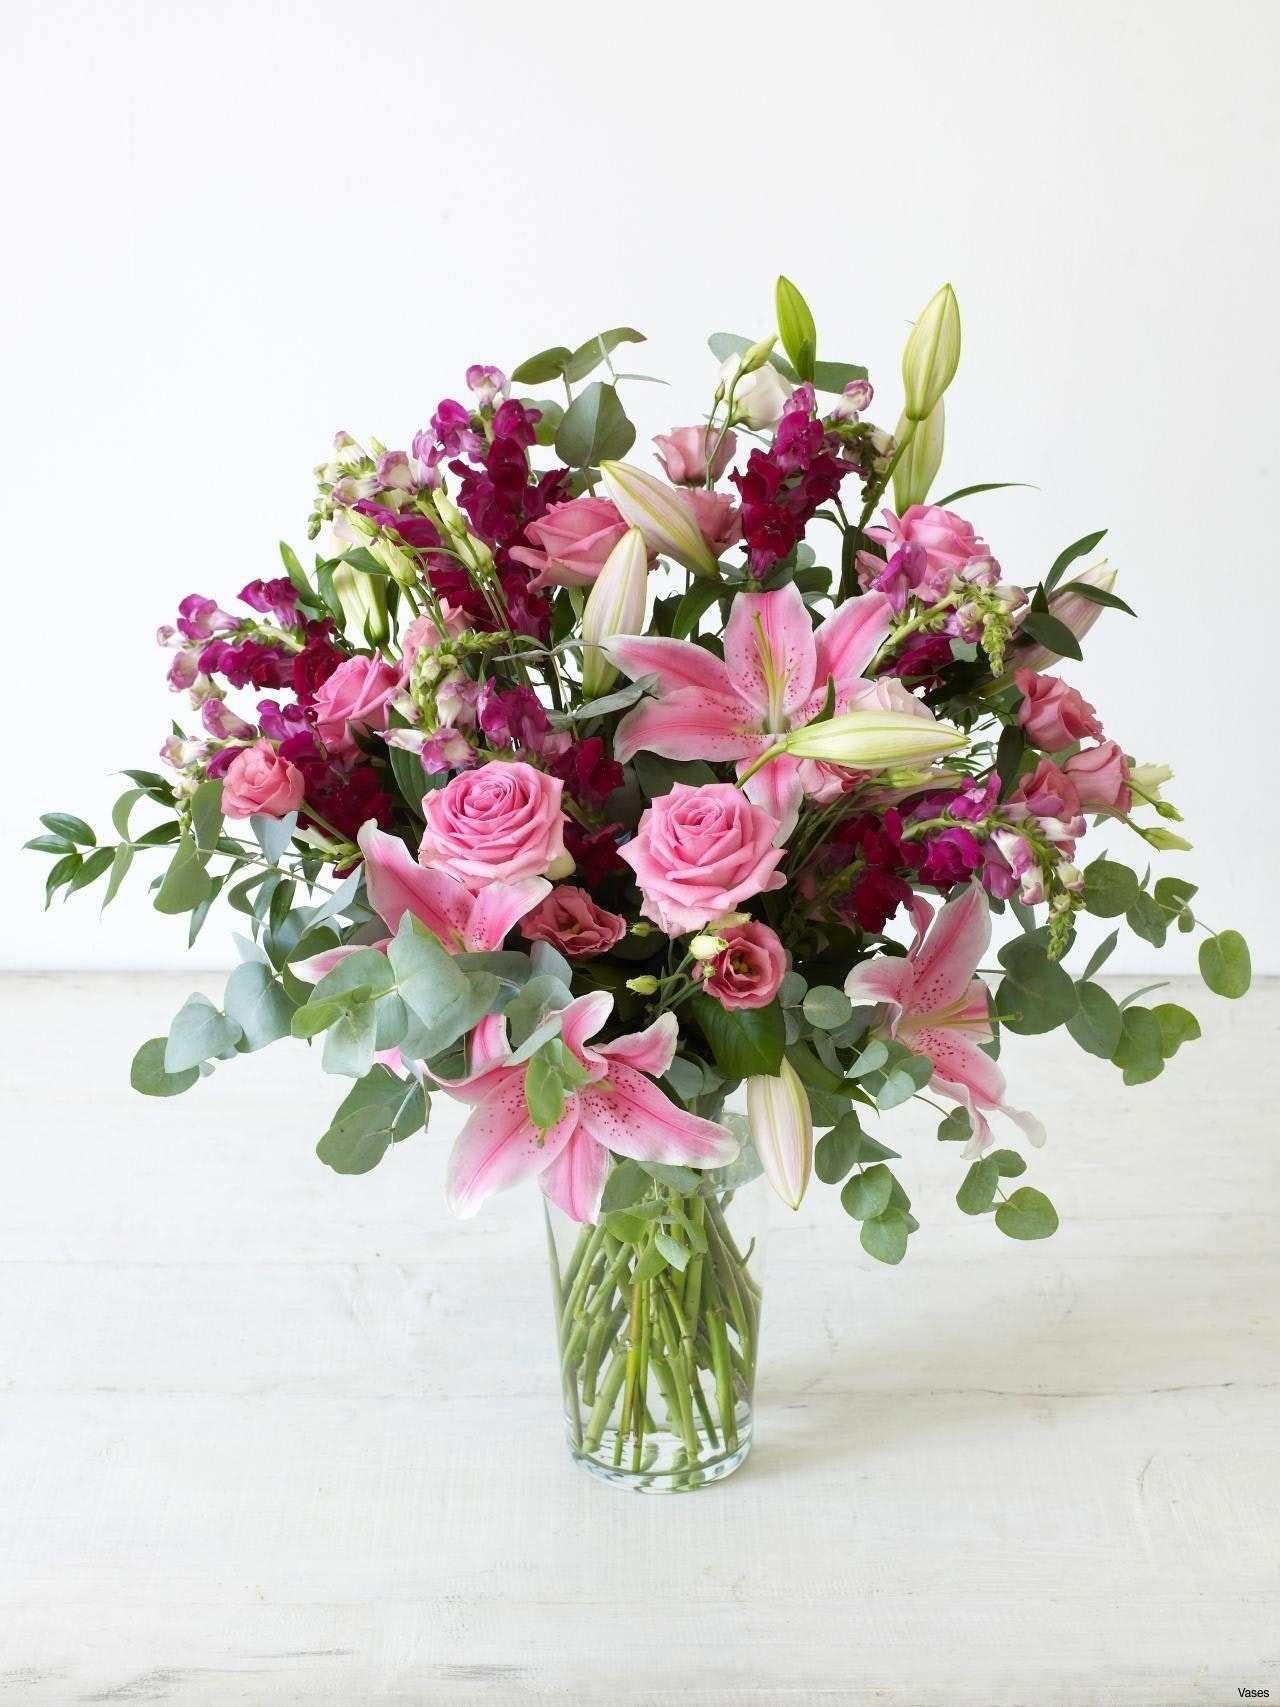 baby shower vases of flower garden ideas elegant flower arrangements elegant floral with regard to flower garden ideas elegant flower arrangements elegant floral arrangements 0d design ideas